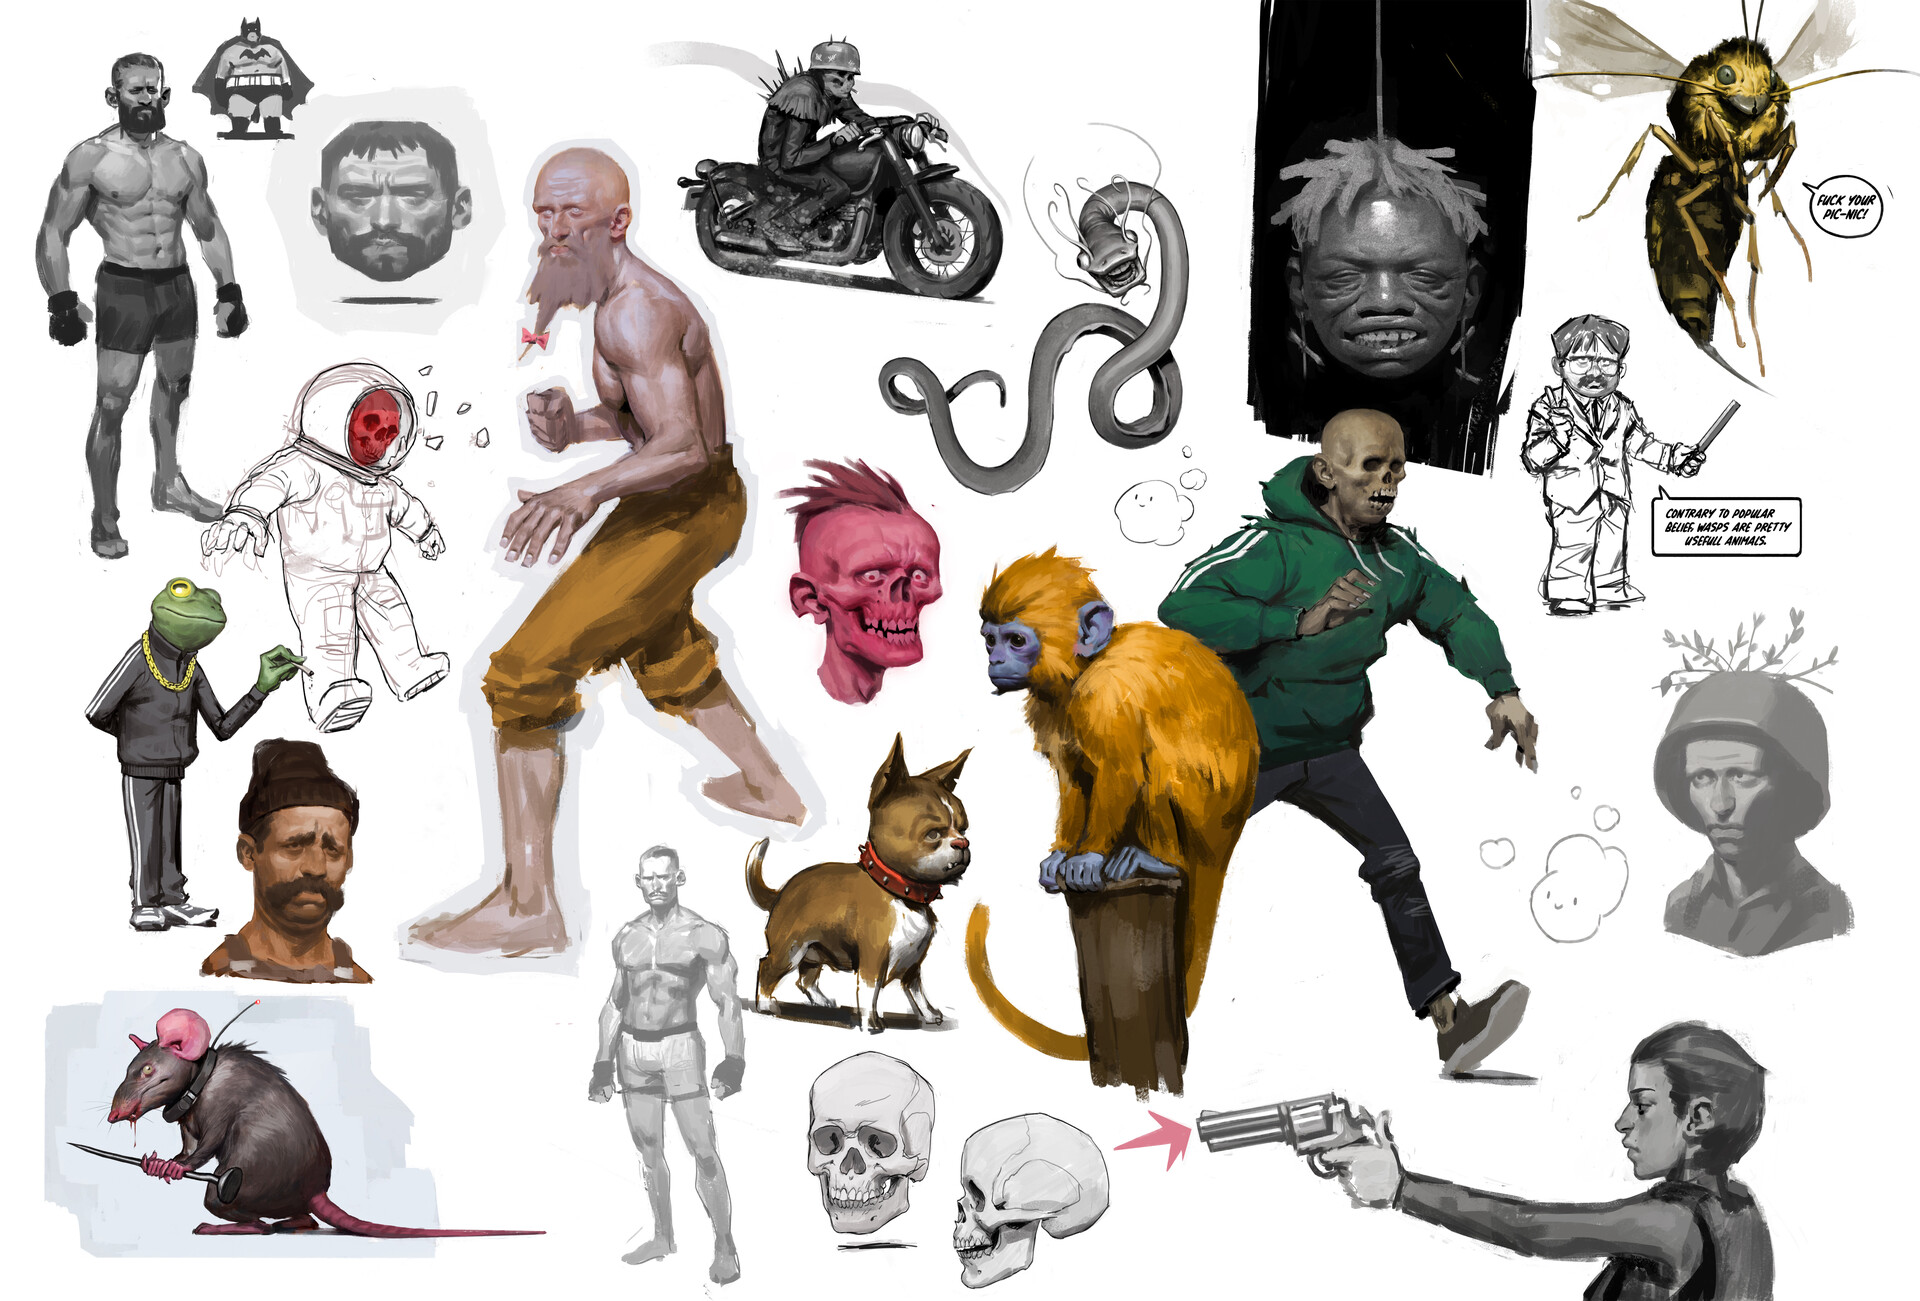 Jens claessens sketchbookp2